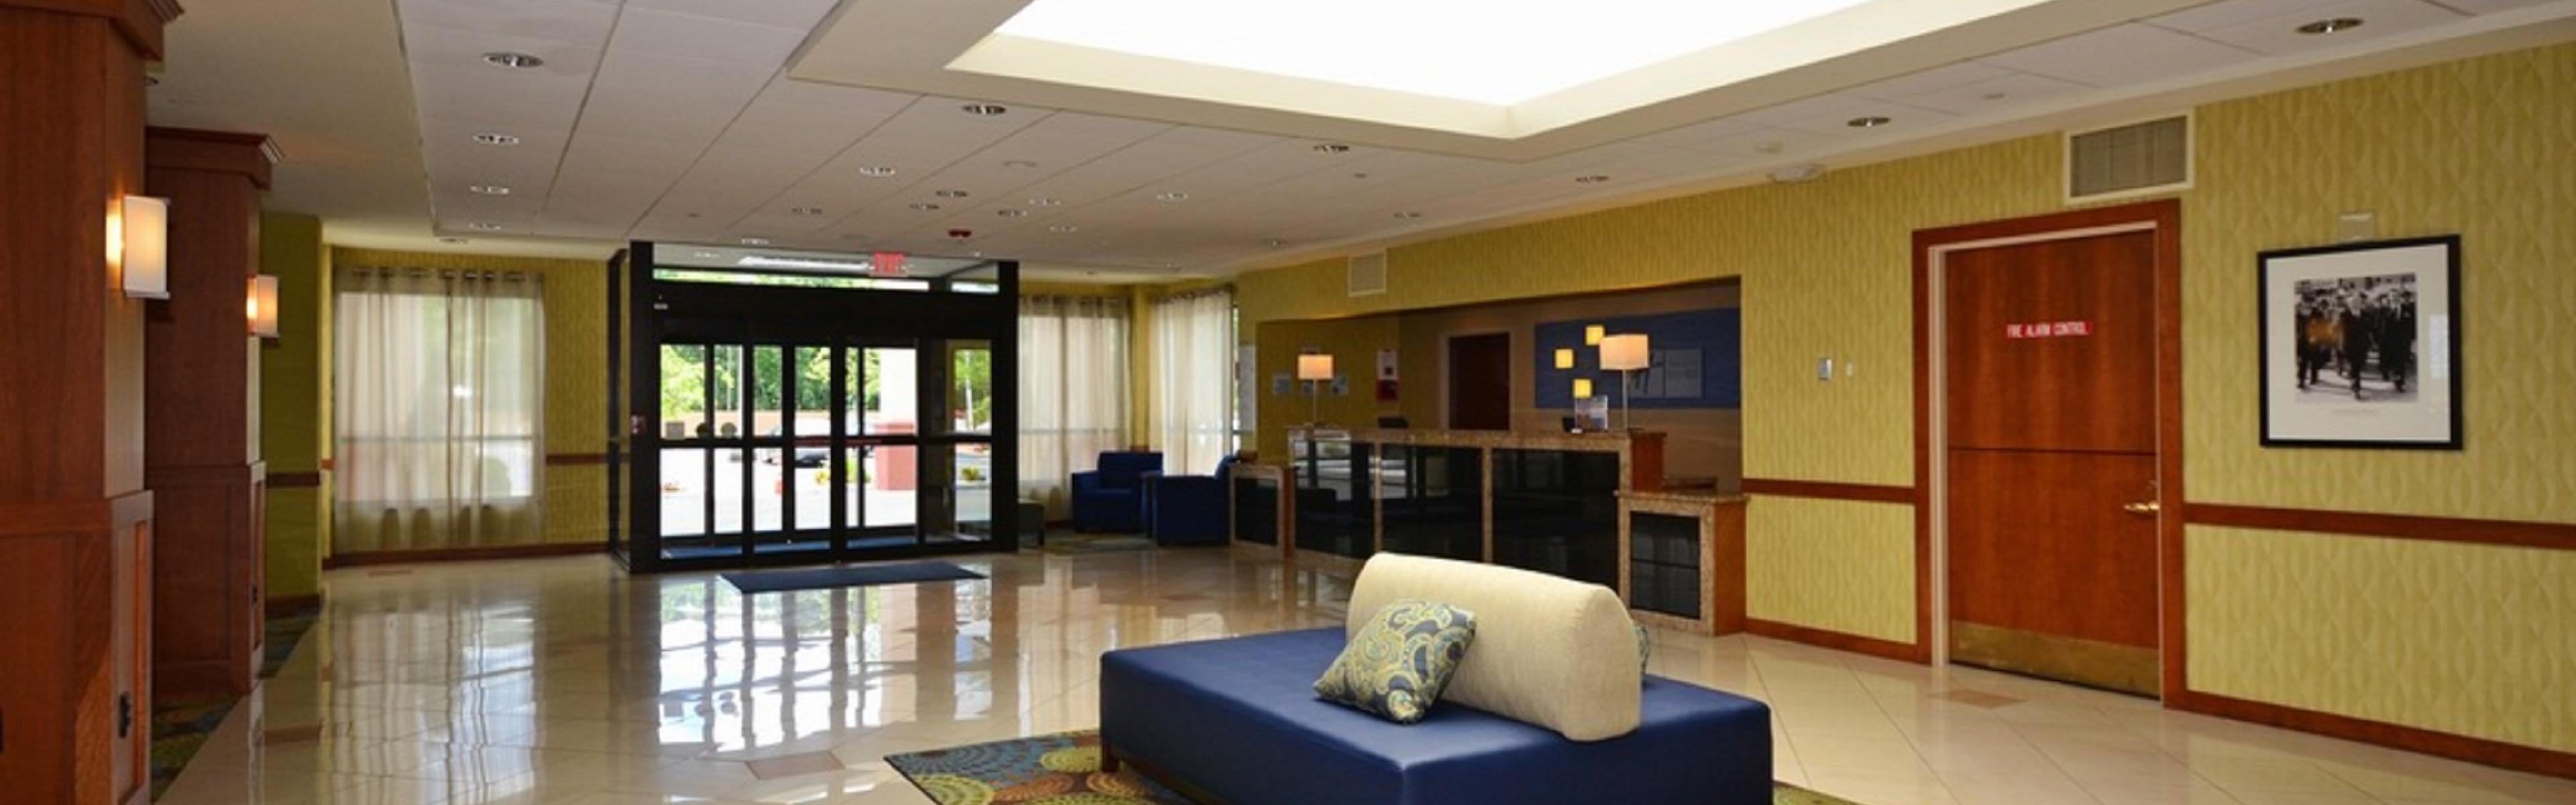 Holiday Inn Express Brockton - Boston image 0